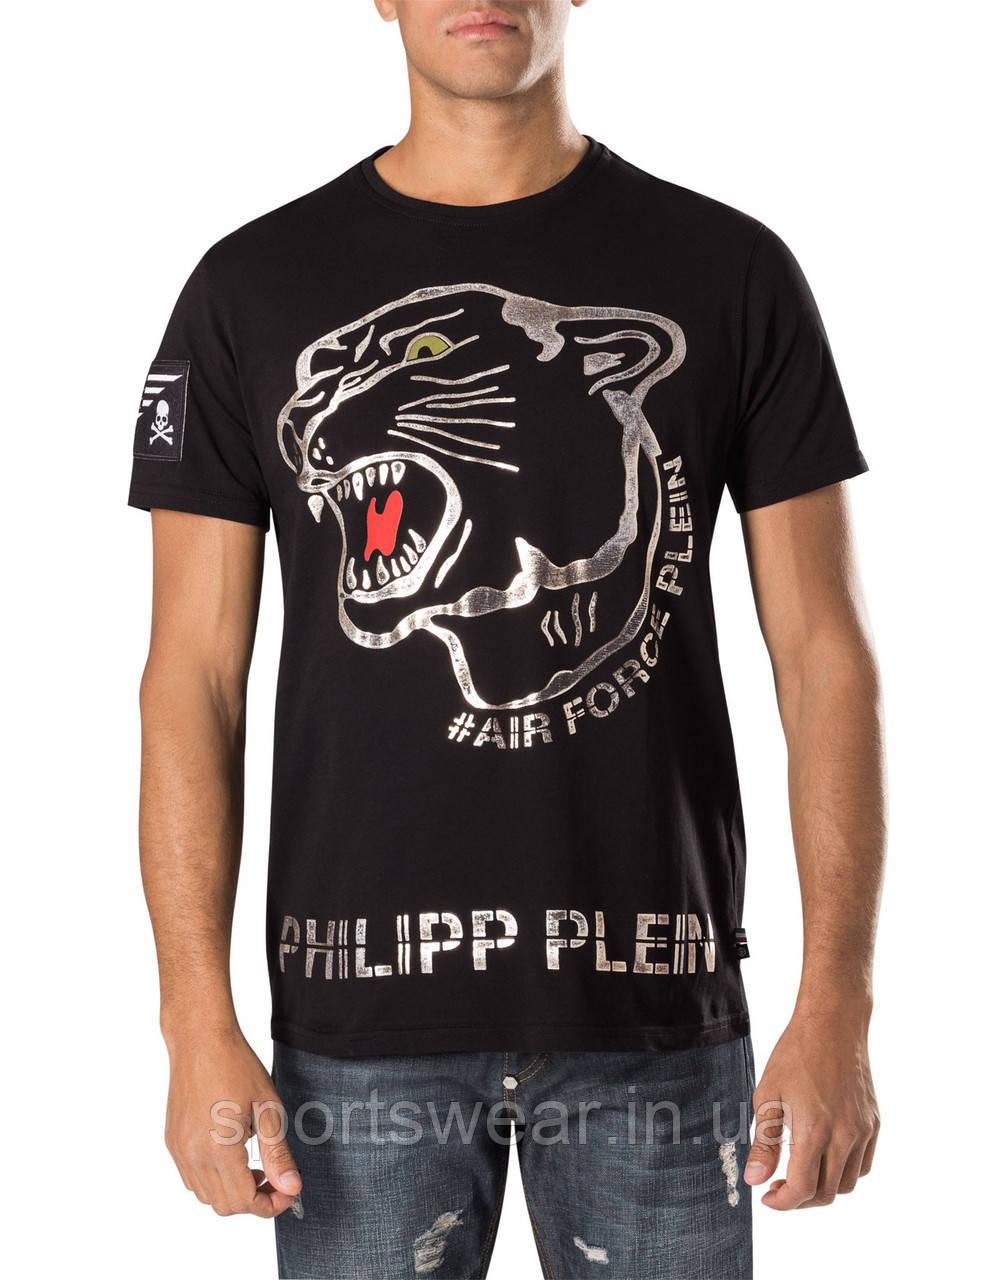 Футболка коричневая Philipp Plein Air Force мужская